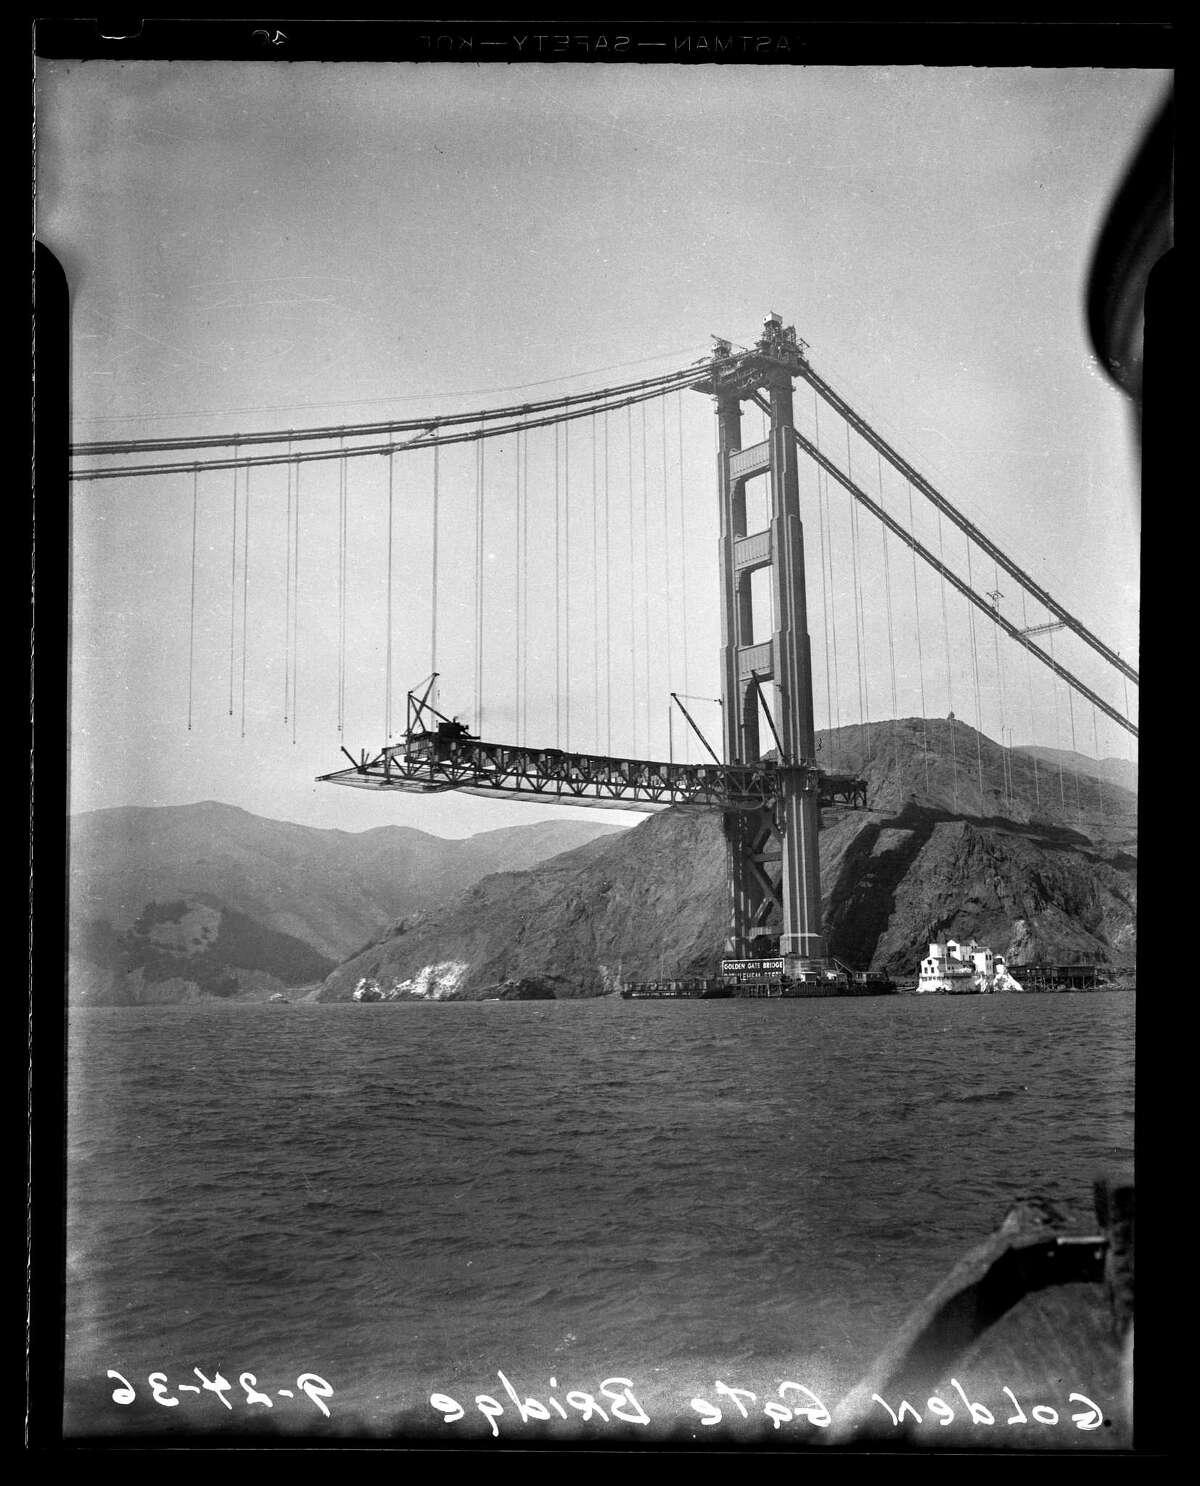 The Golden Gate Bridge under construction in September 1936.